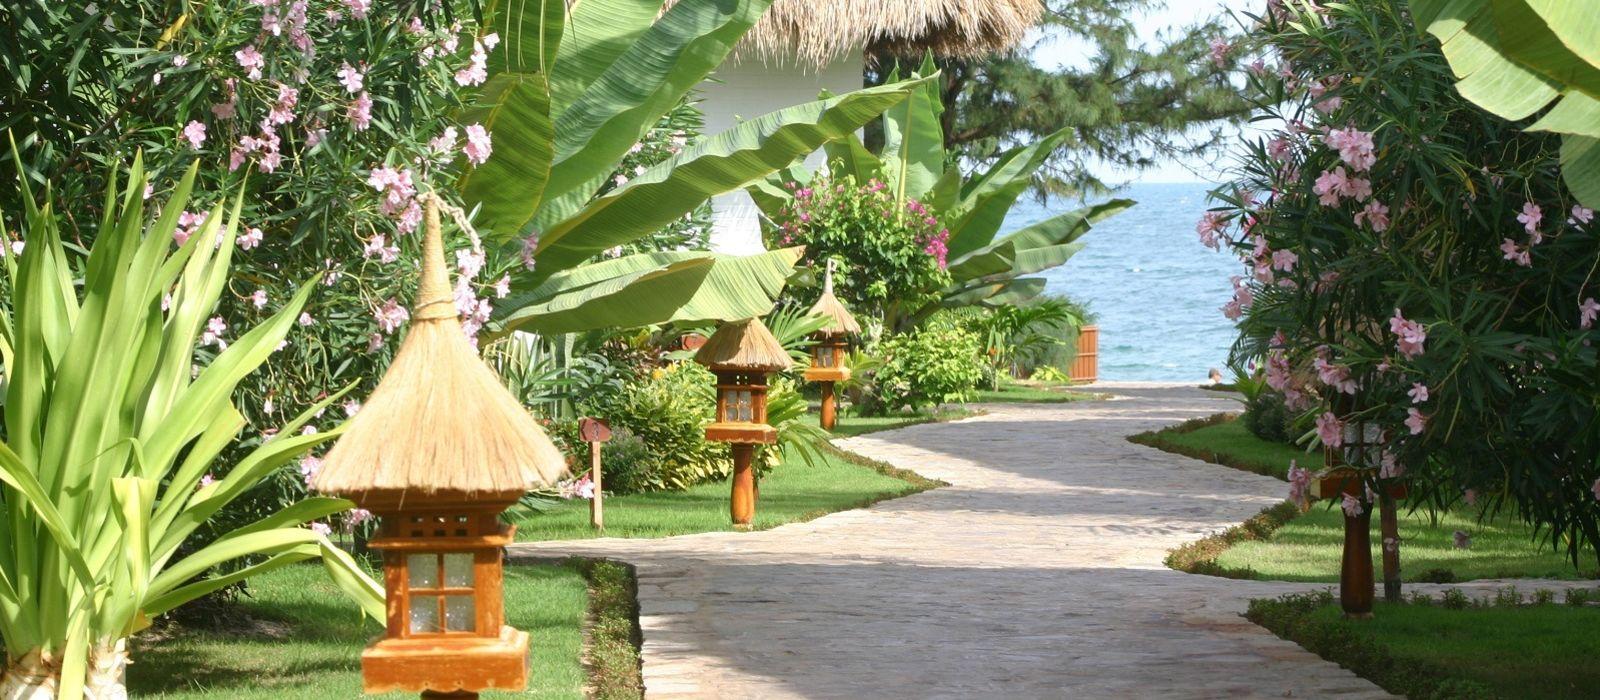 Hotel Cham Villas (Mui Ne) Vietnam